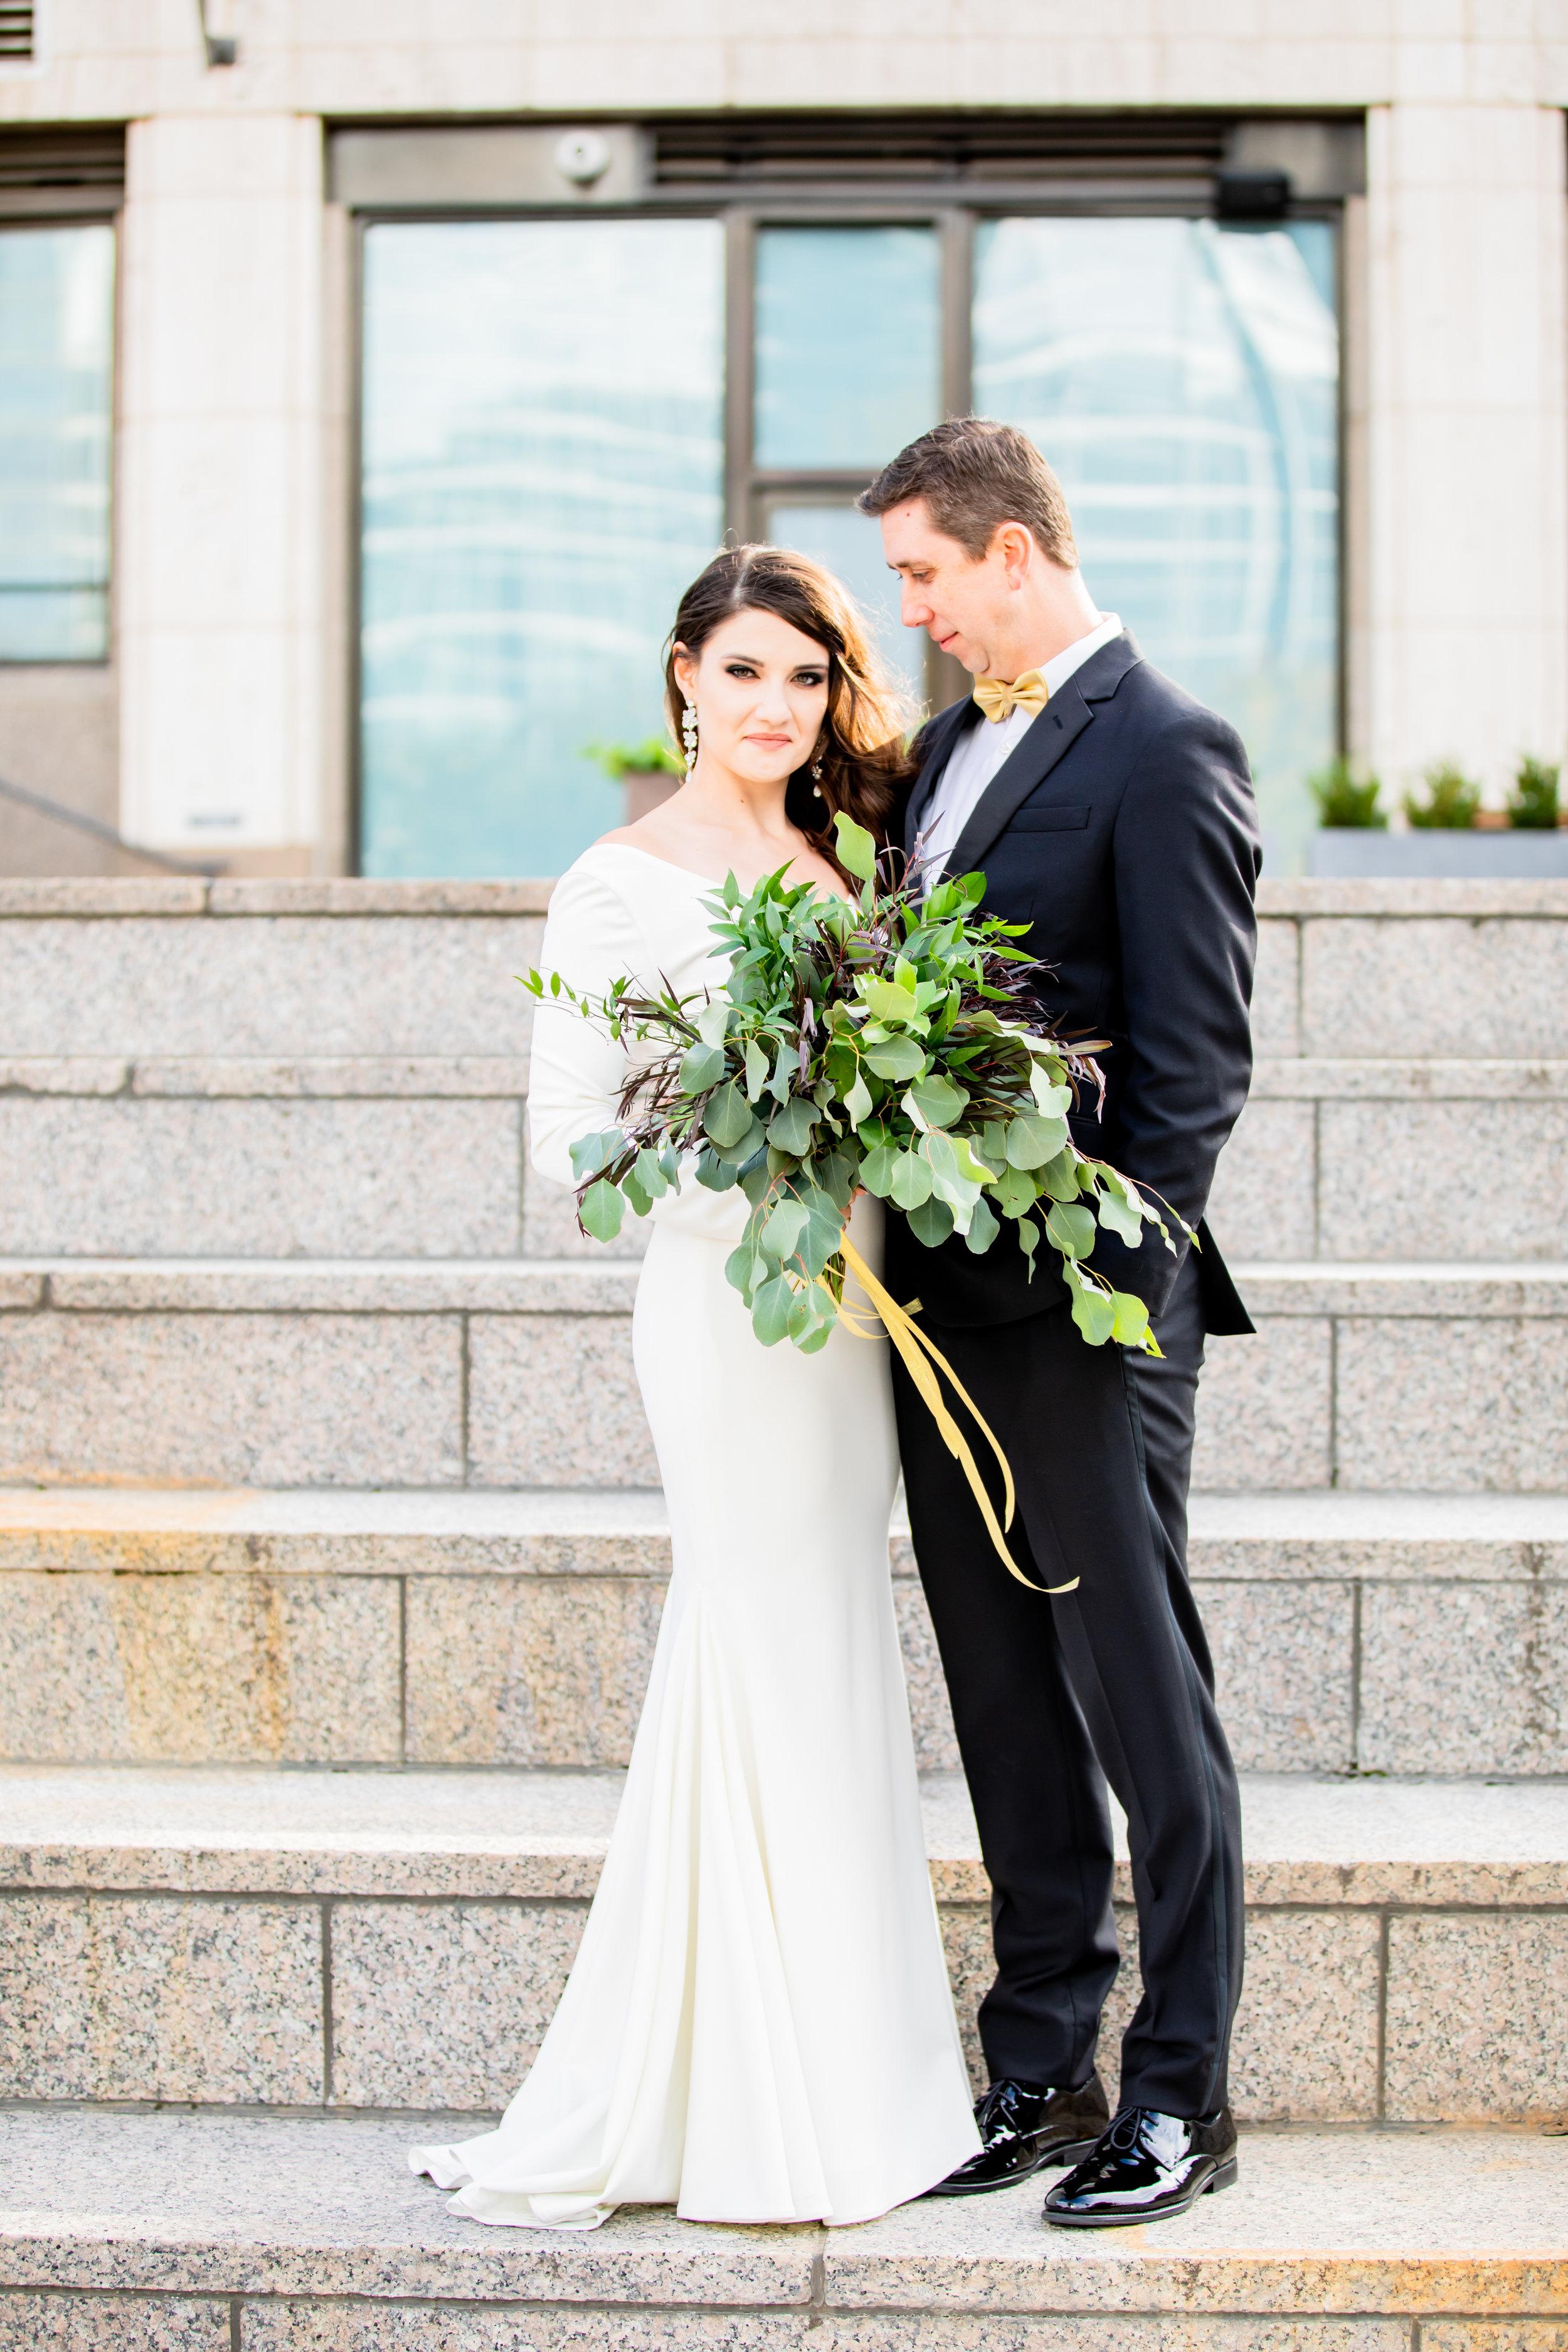 Wedding_Atlanta_Emily_Lester_Photography-1145.jpg